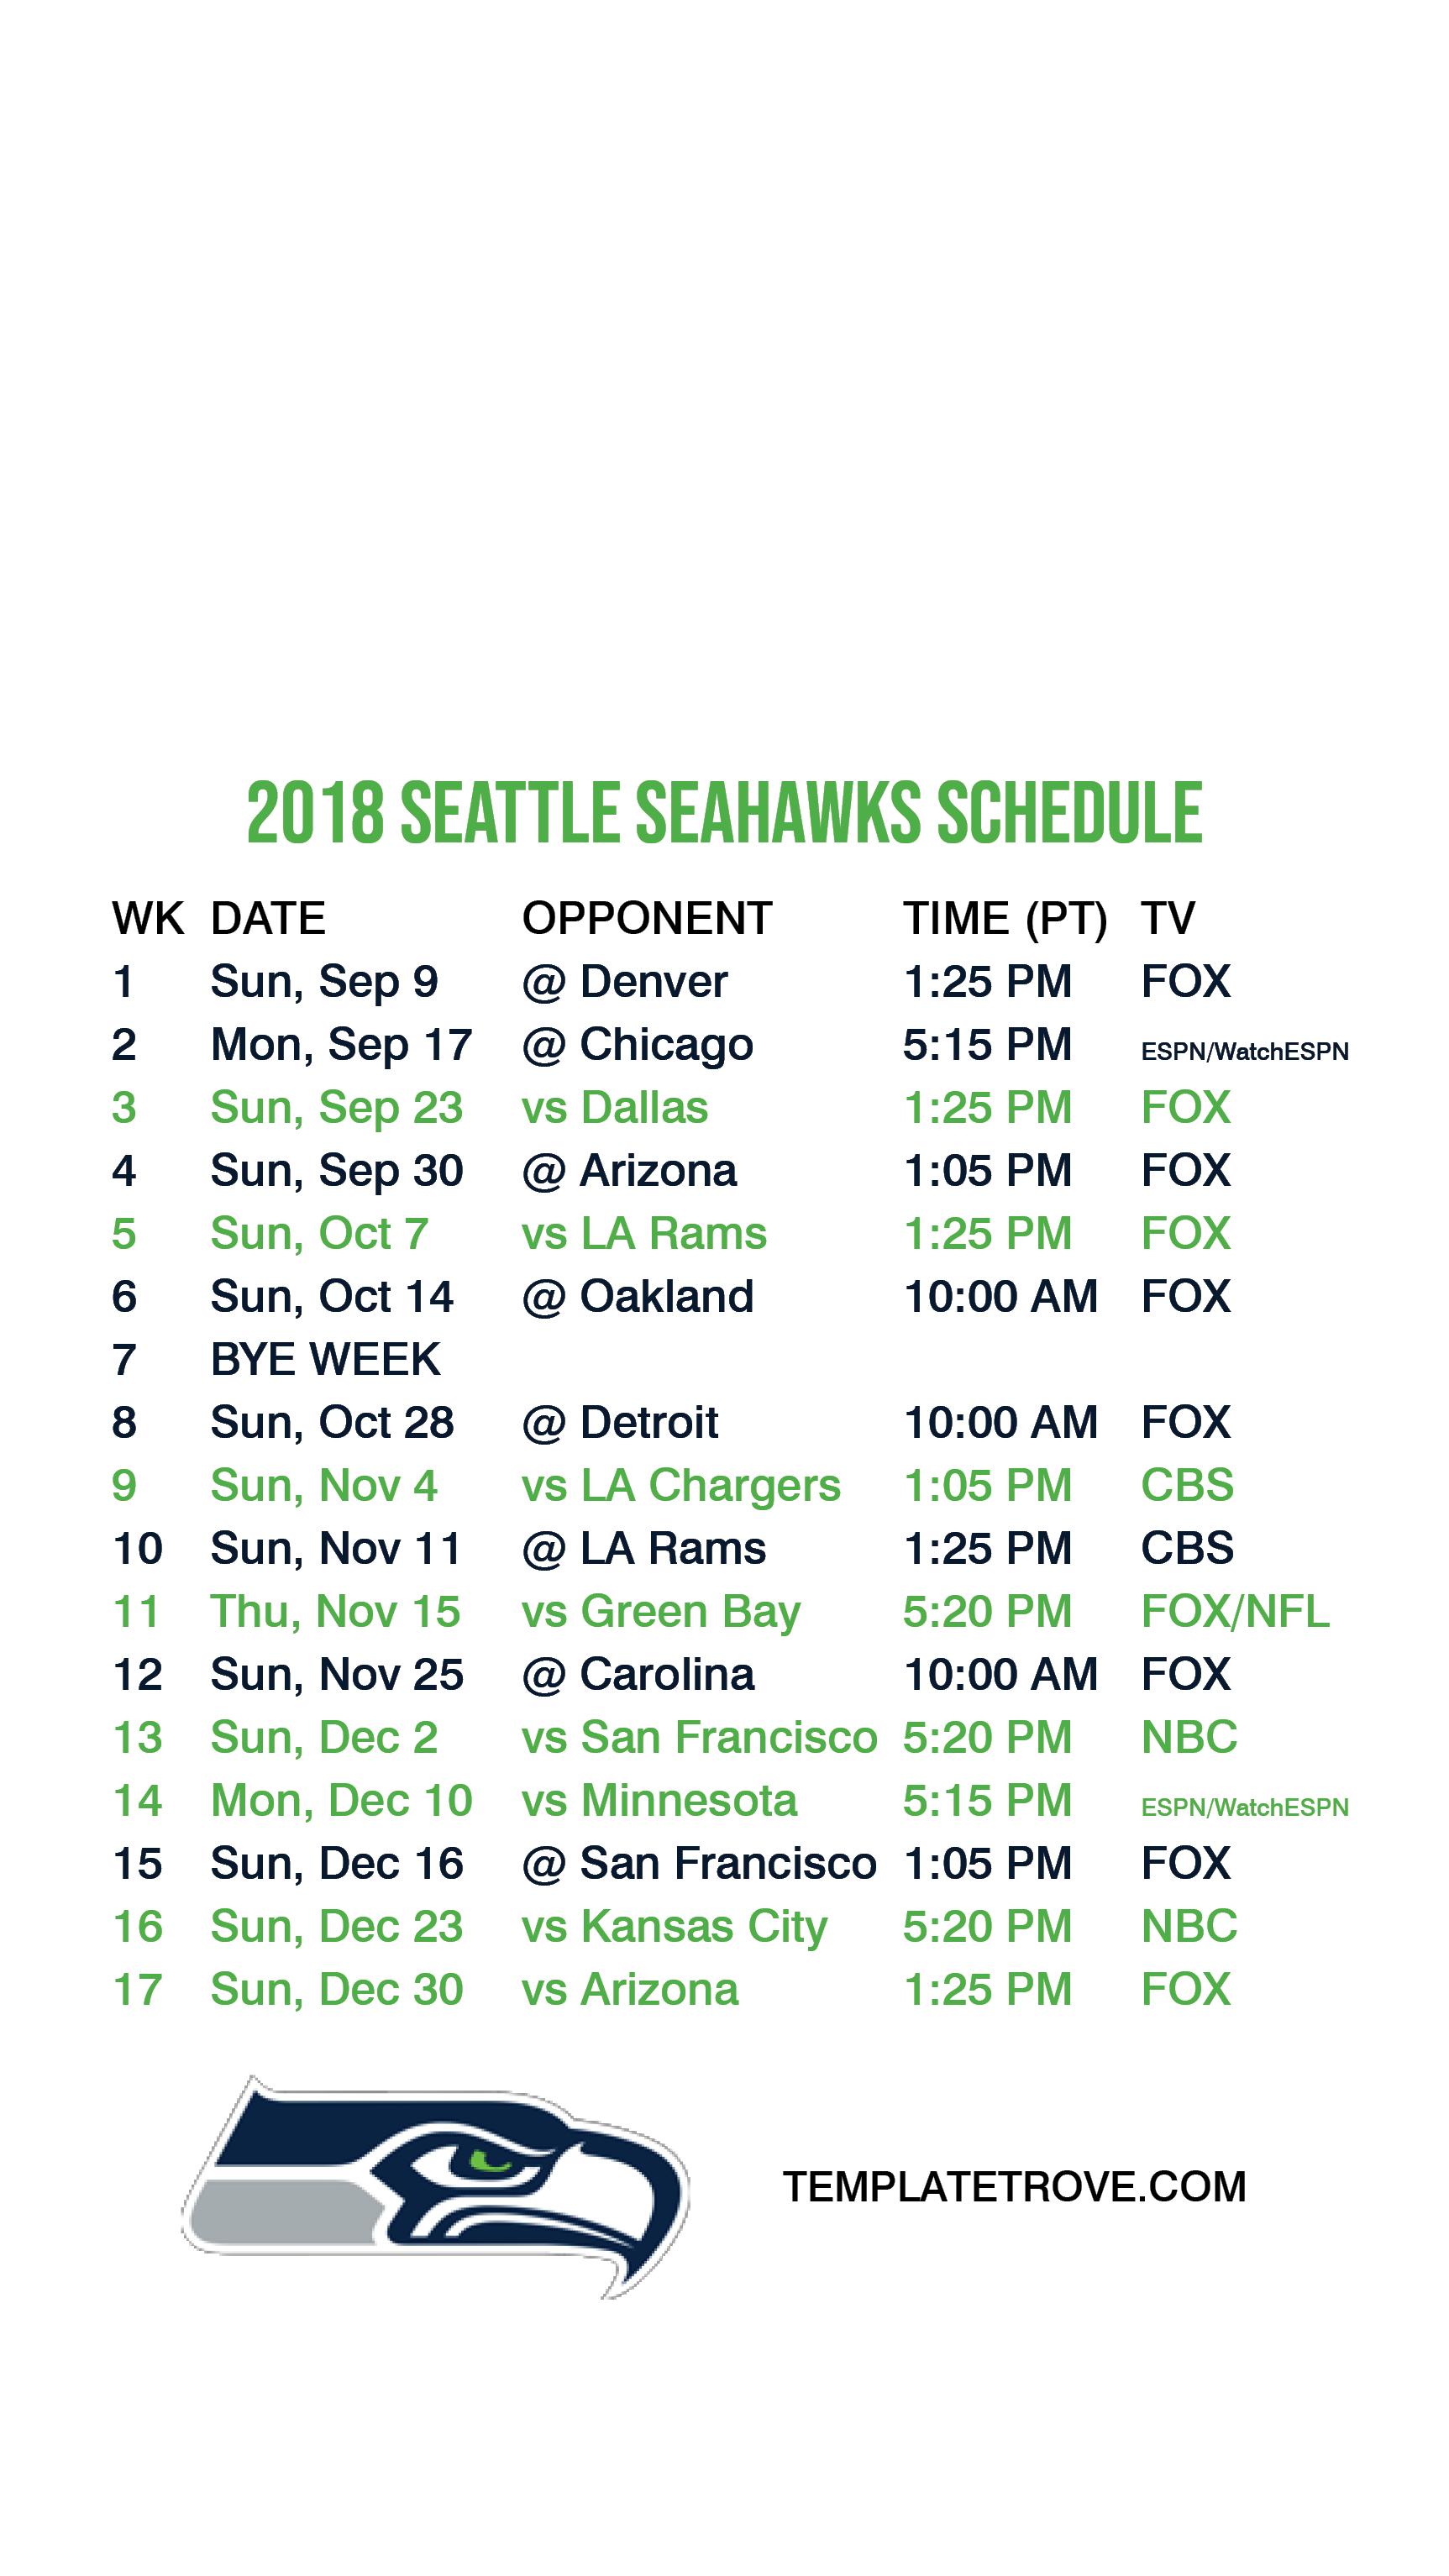 picture regarding Seattle Seahawks Printable Schedule named 2018-2019 Seattle Seahawks Lock Display Program for apple iphone 6